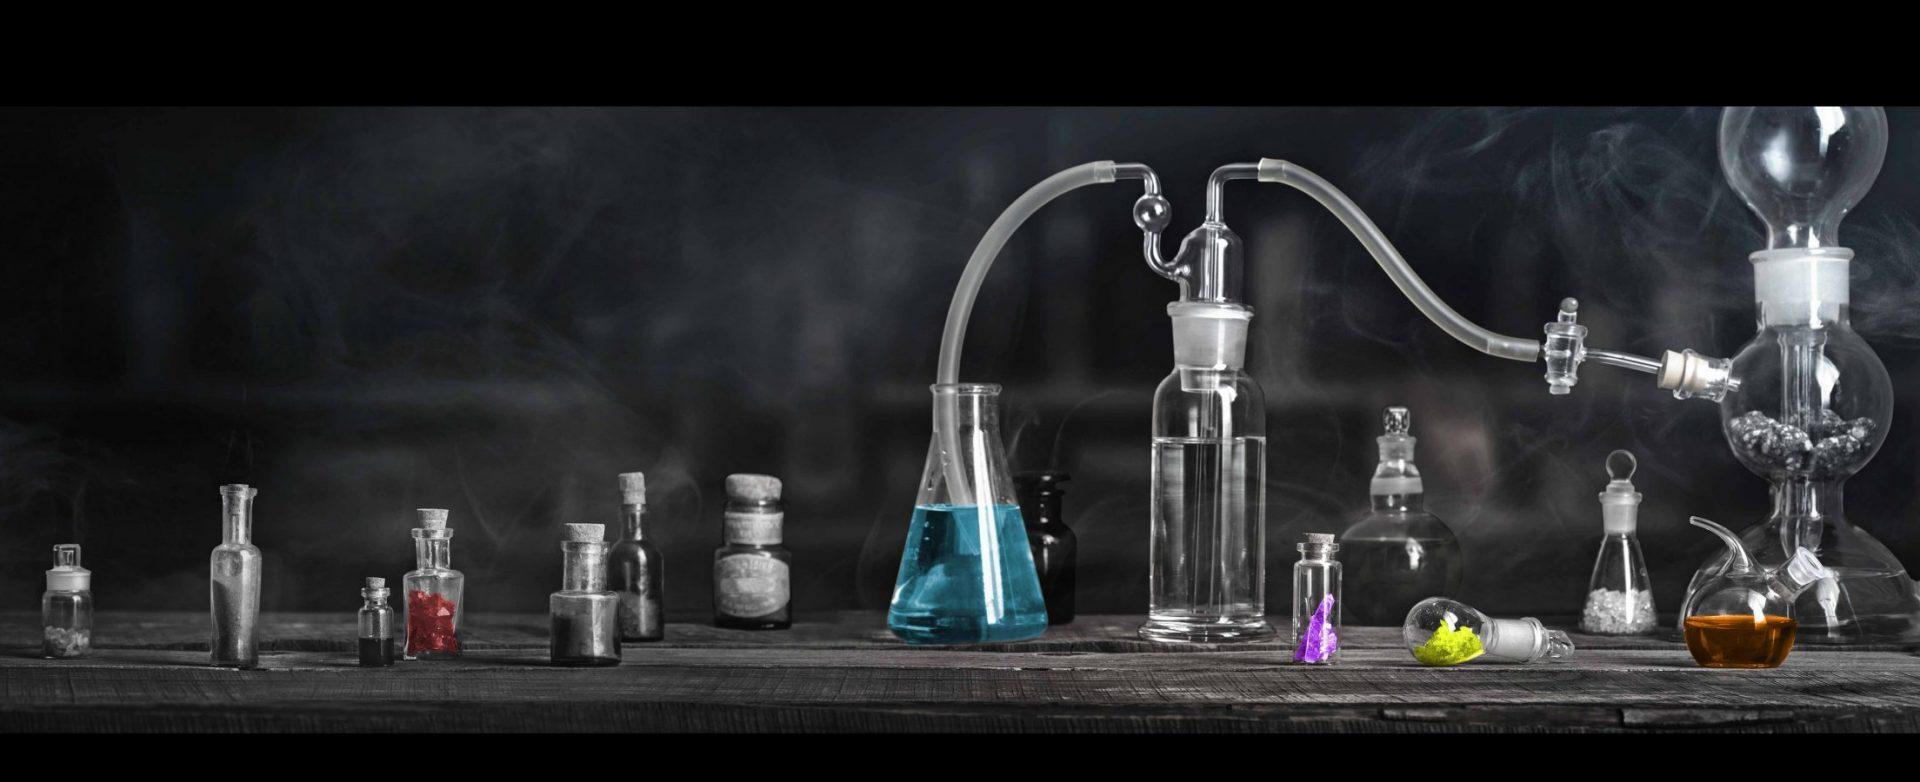 chemistry@home